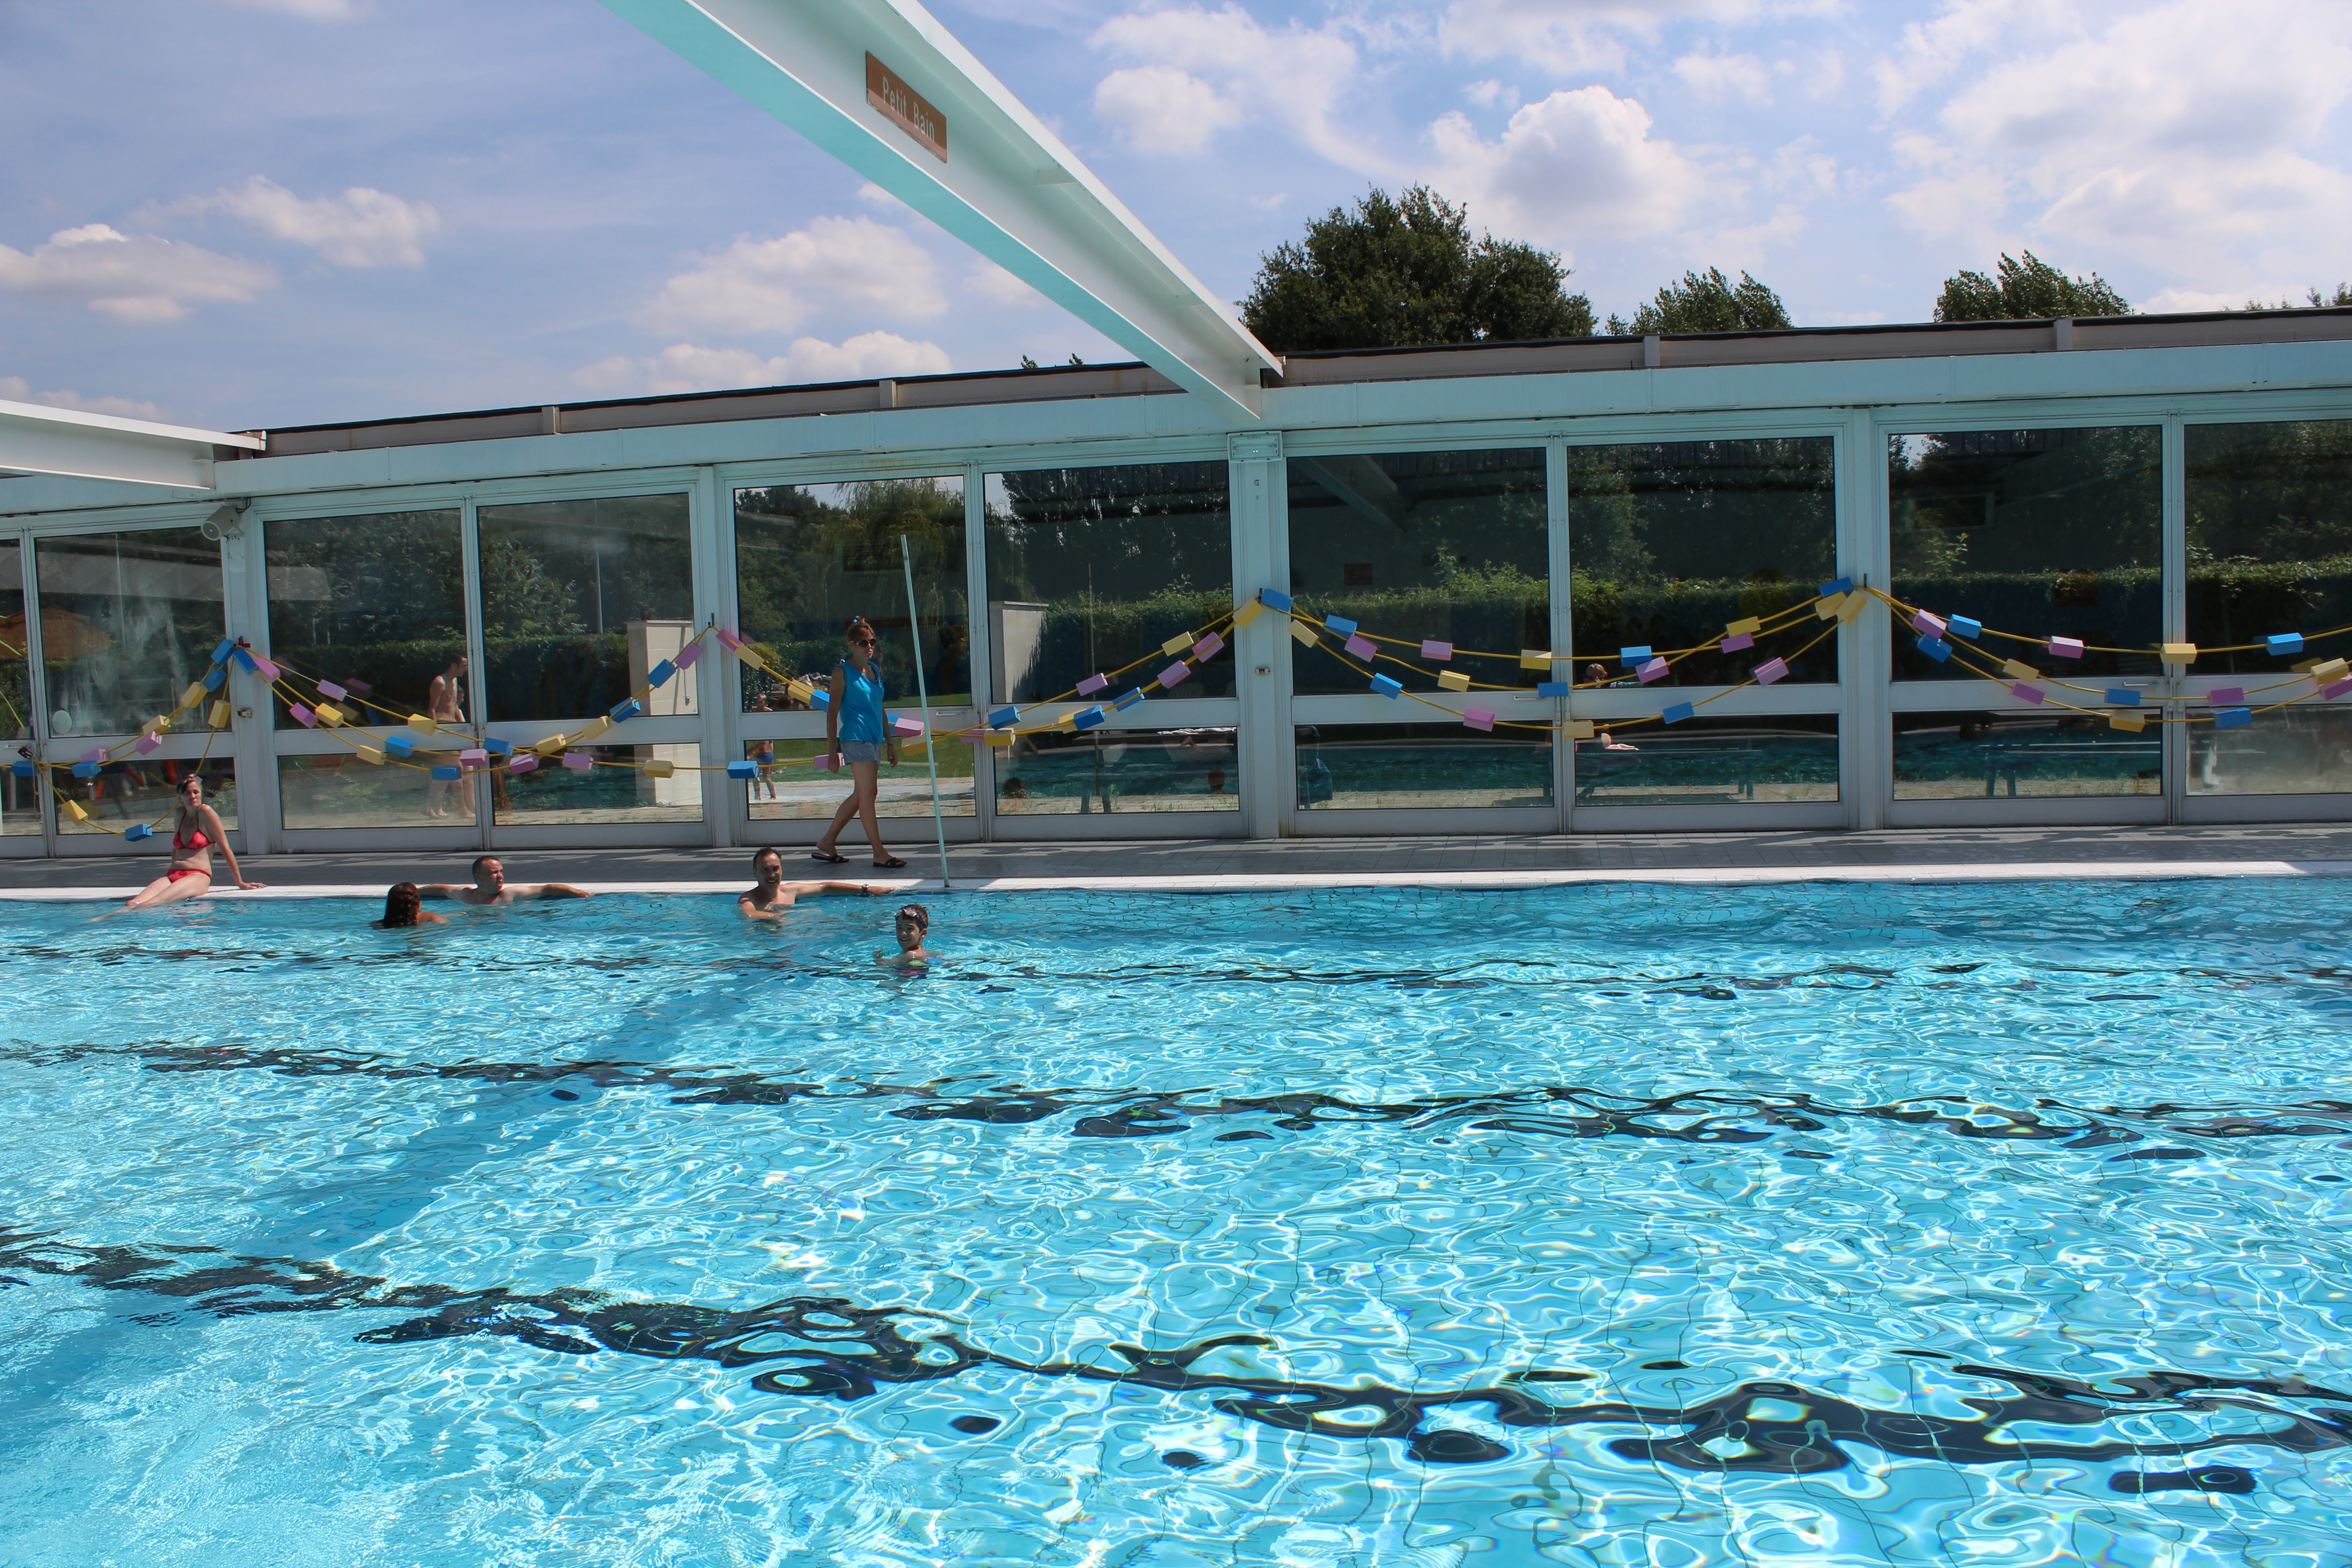 luxe piscine pour femme kehl piscine. Black Bedroom Furniture Sets. Home Design Ideas